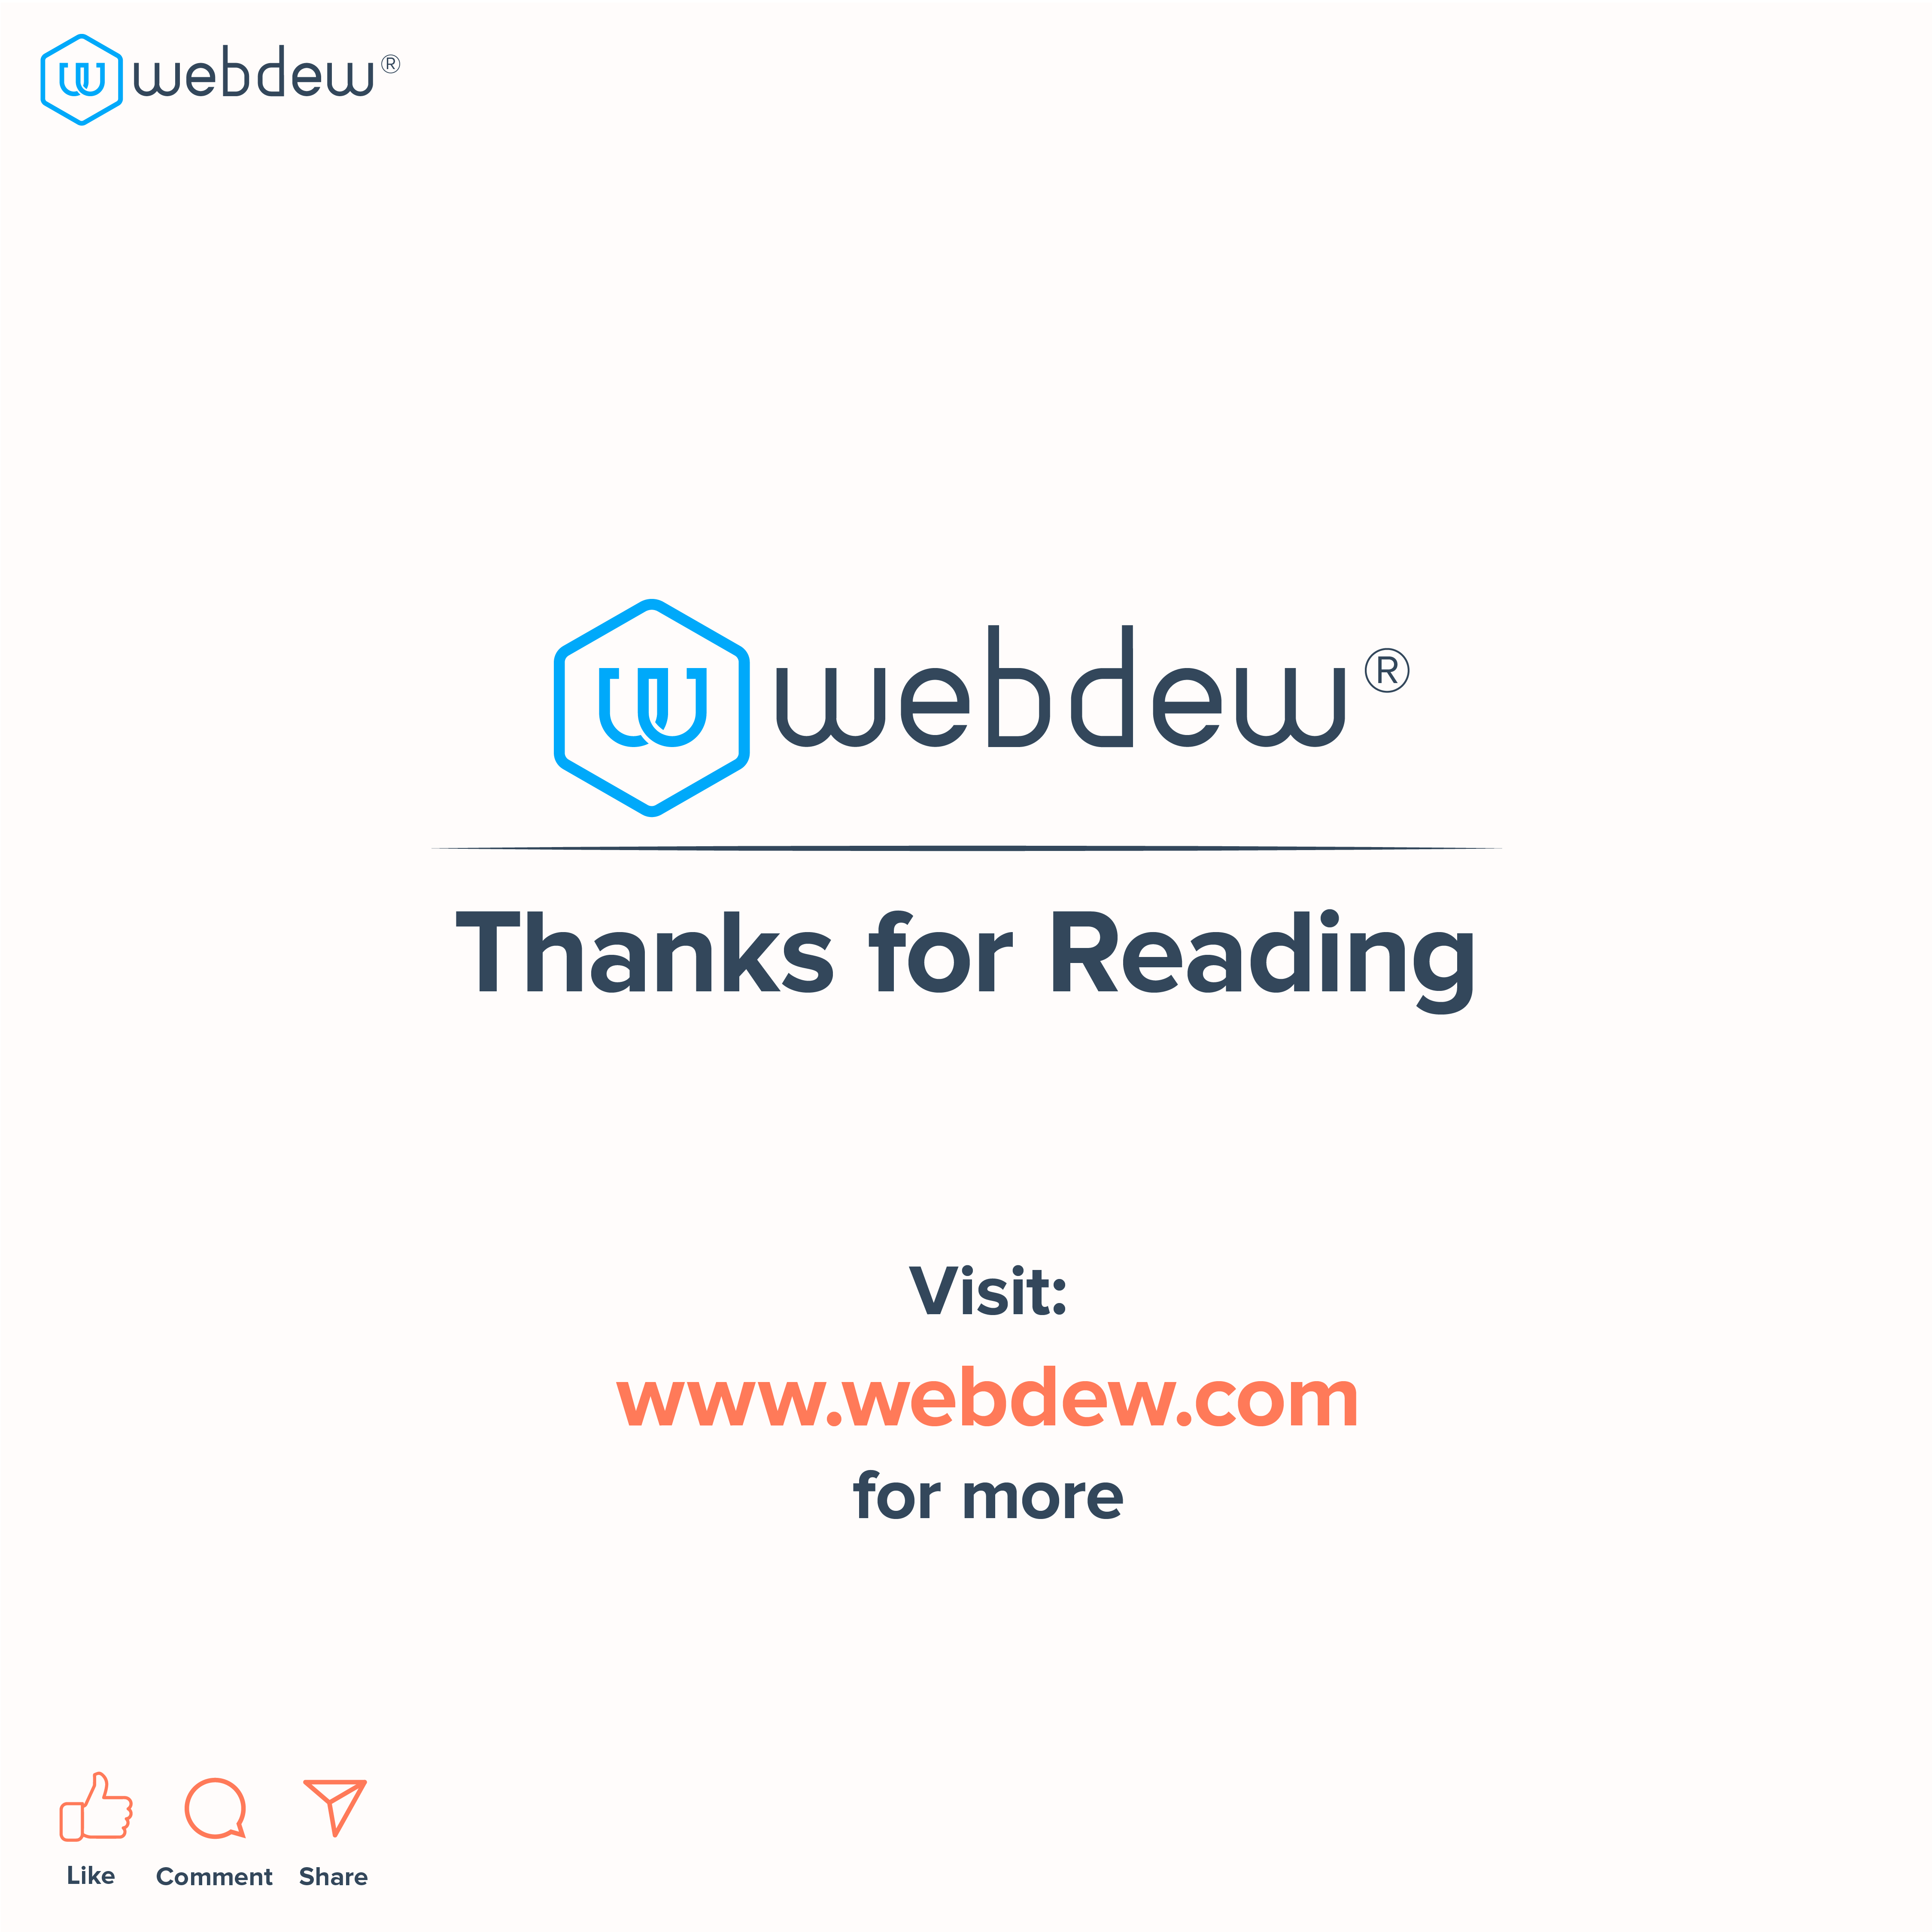 8. thanks for reading